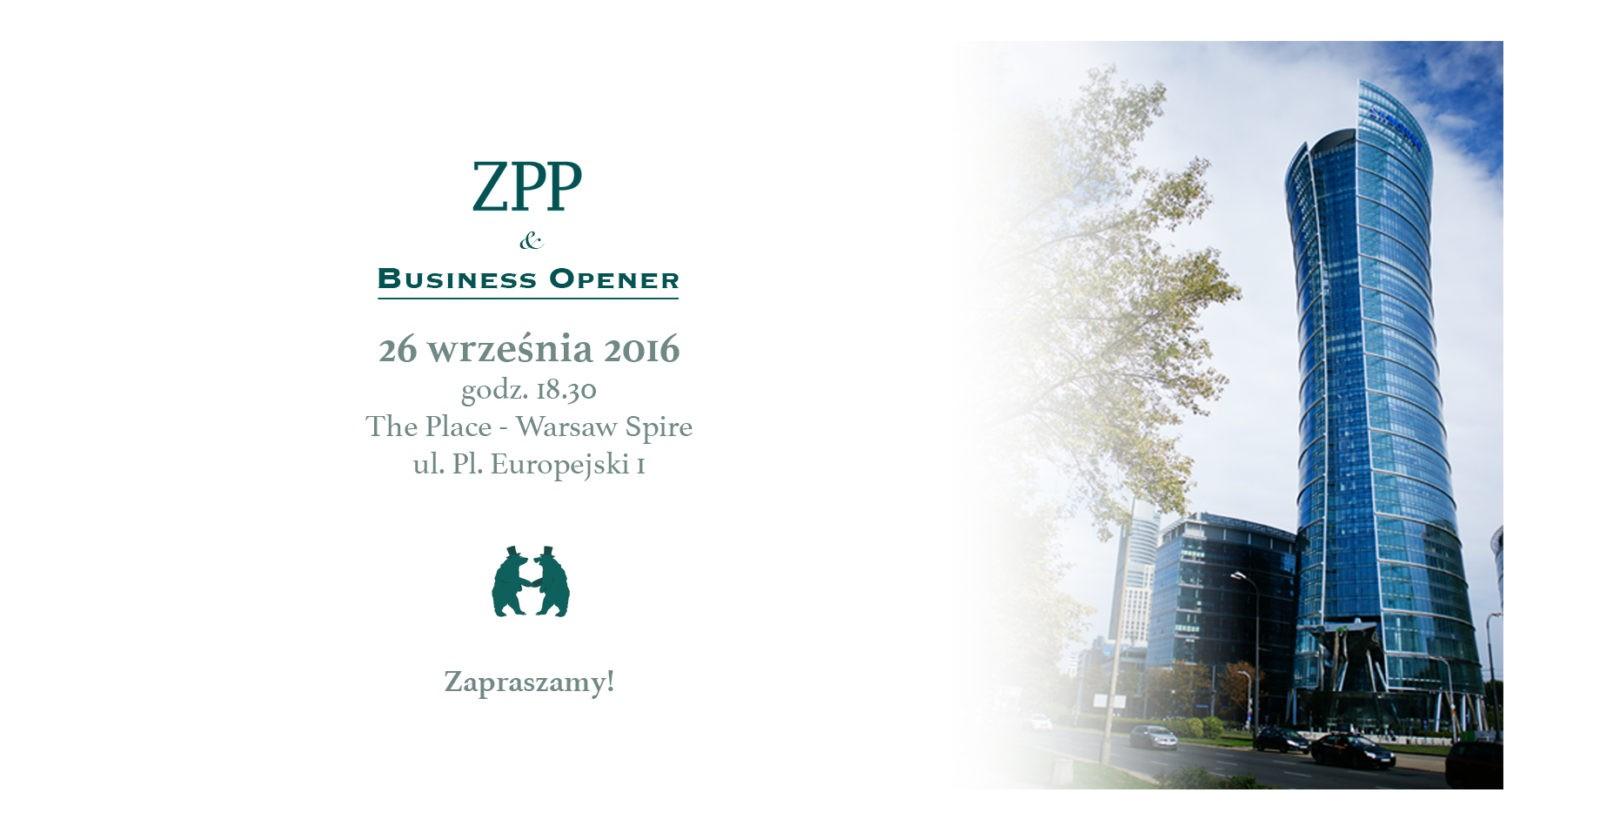 zpp-business-opener